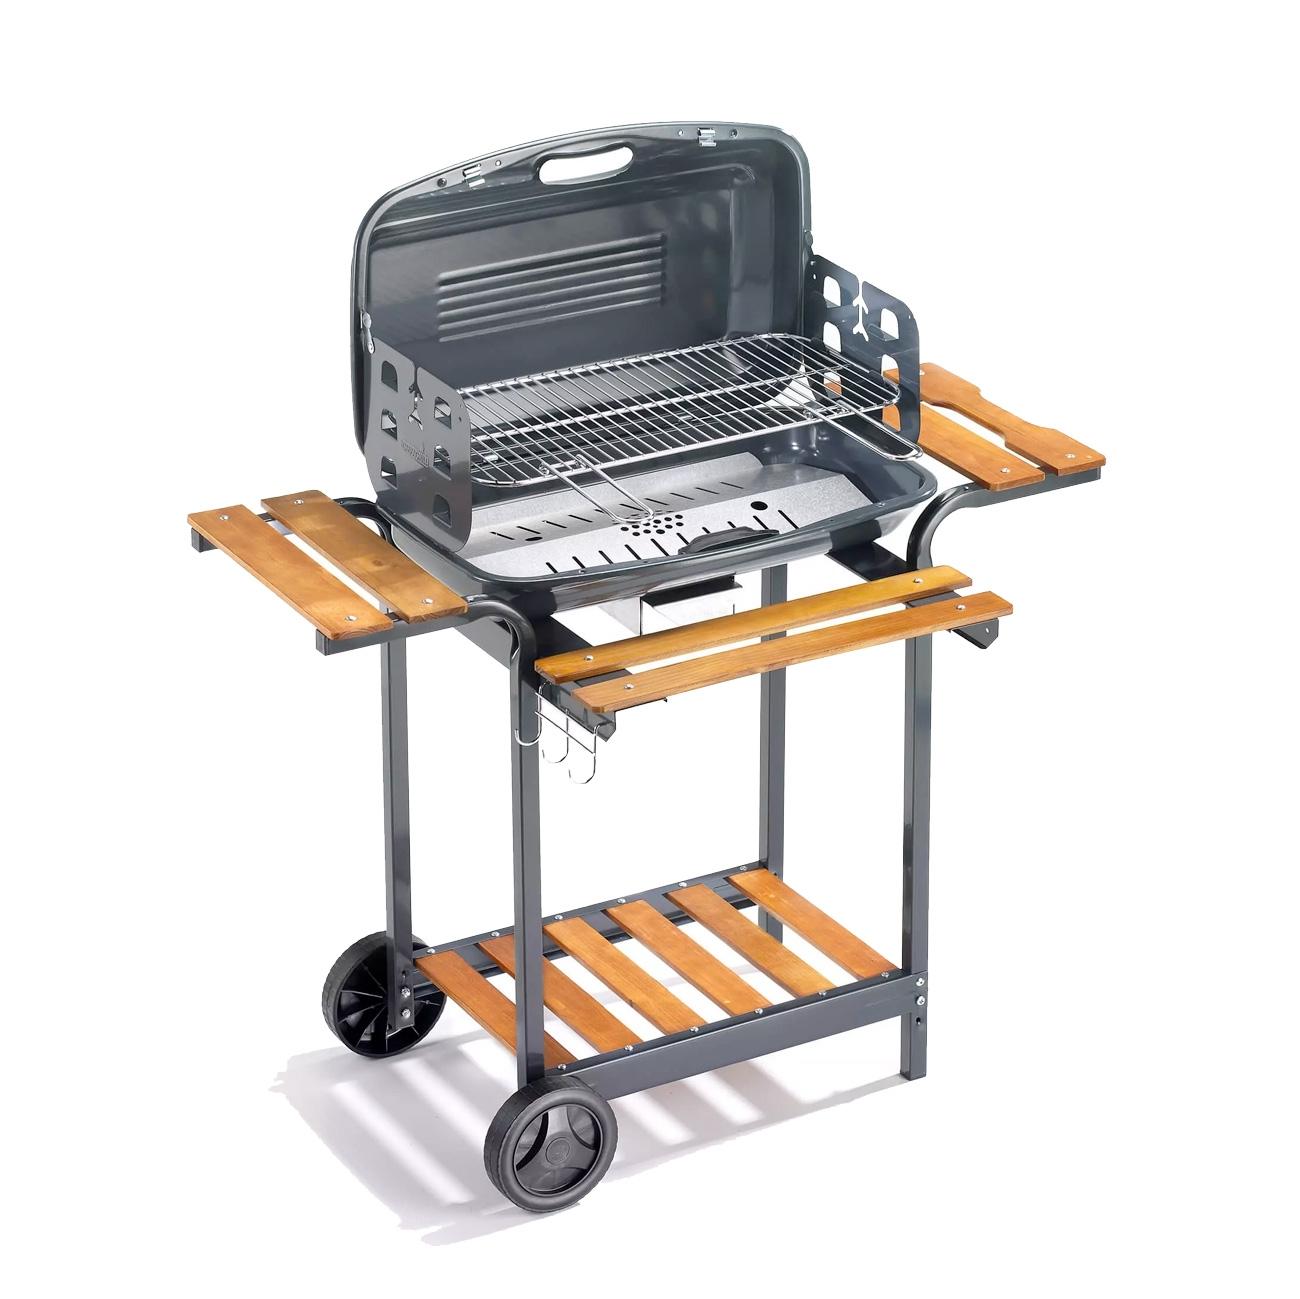 Image of Barbecue a carbonella Ompagrill 60-40 Saturno/rcn